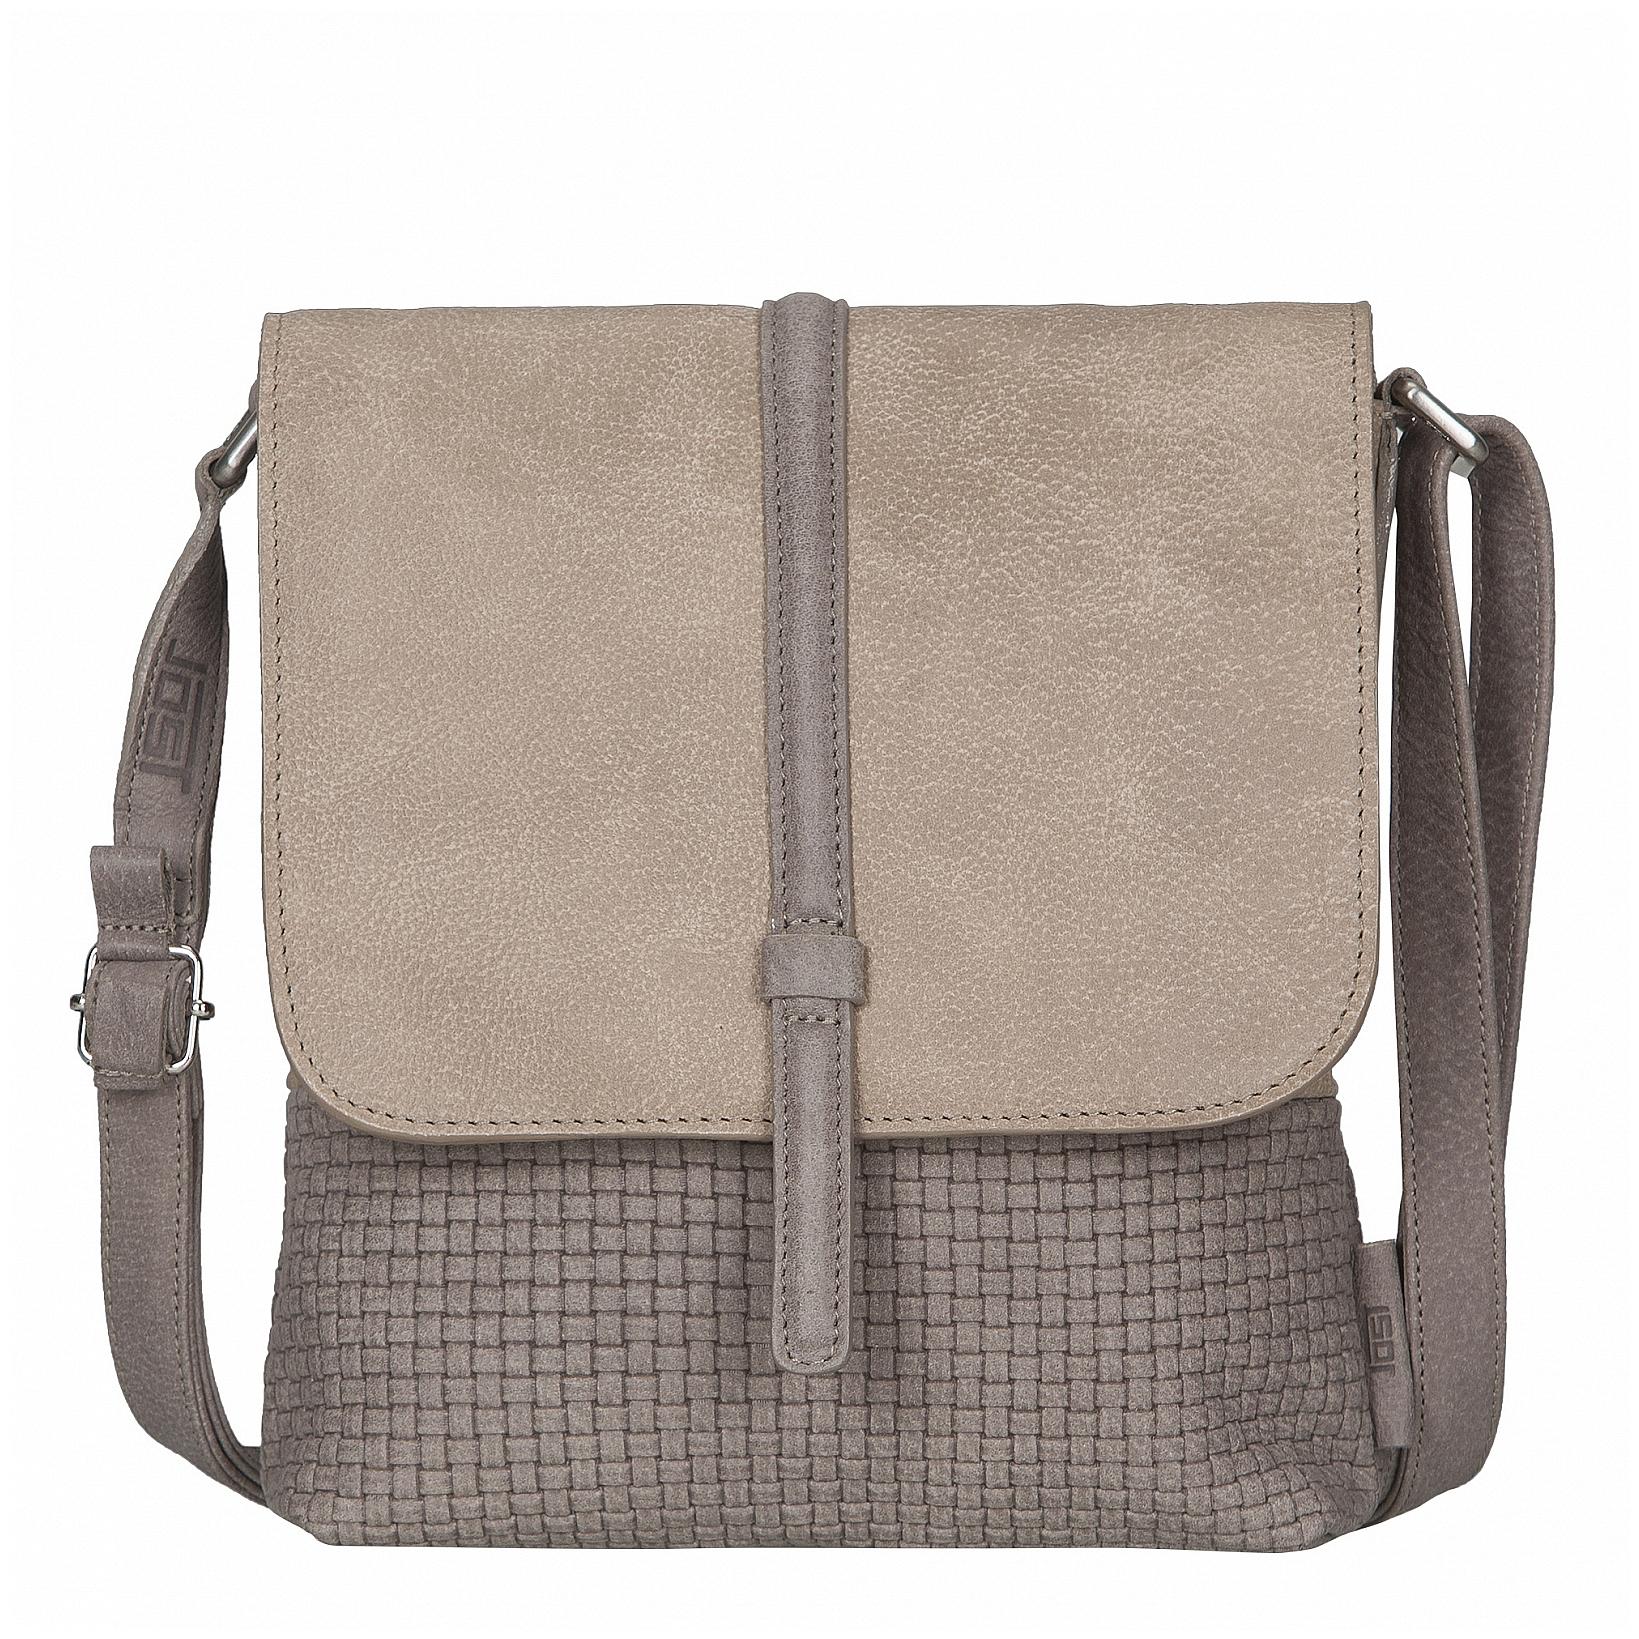 JOST Dámská kožená taška přes rameno TRECCIA 2579-998 pískovo-béžová